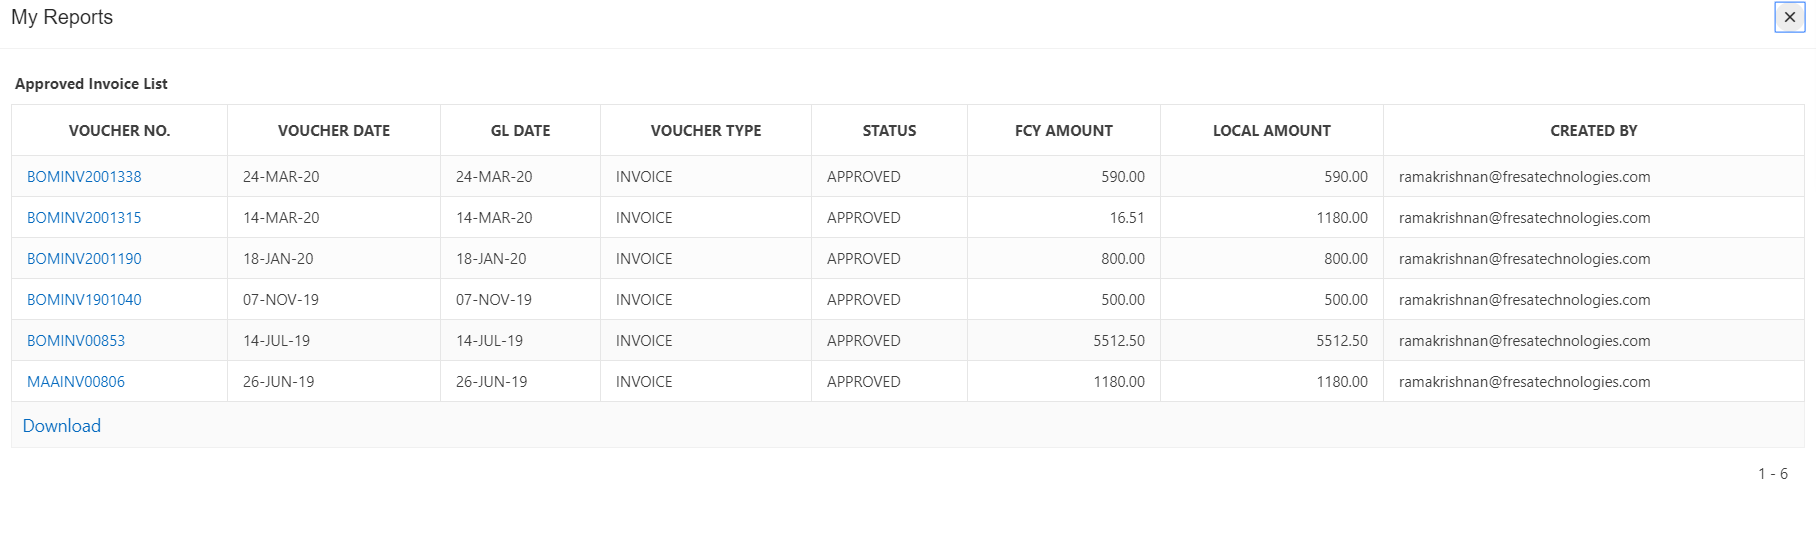 Invoice List